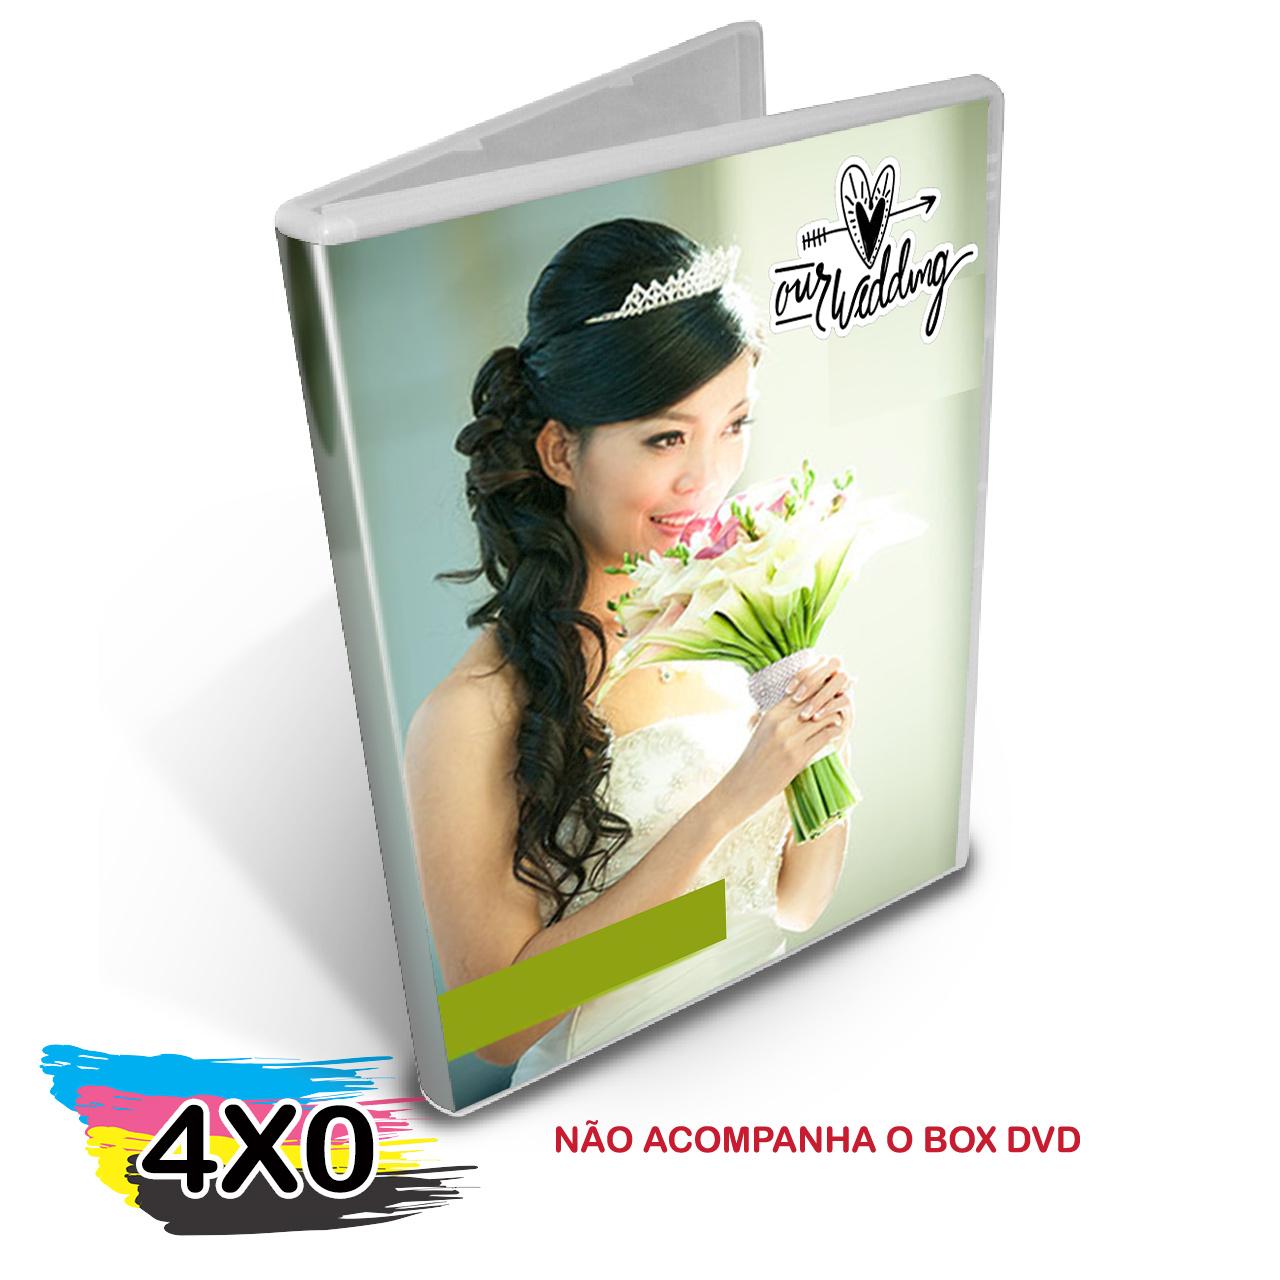 encarte-para-dvd-002.jpg